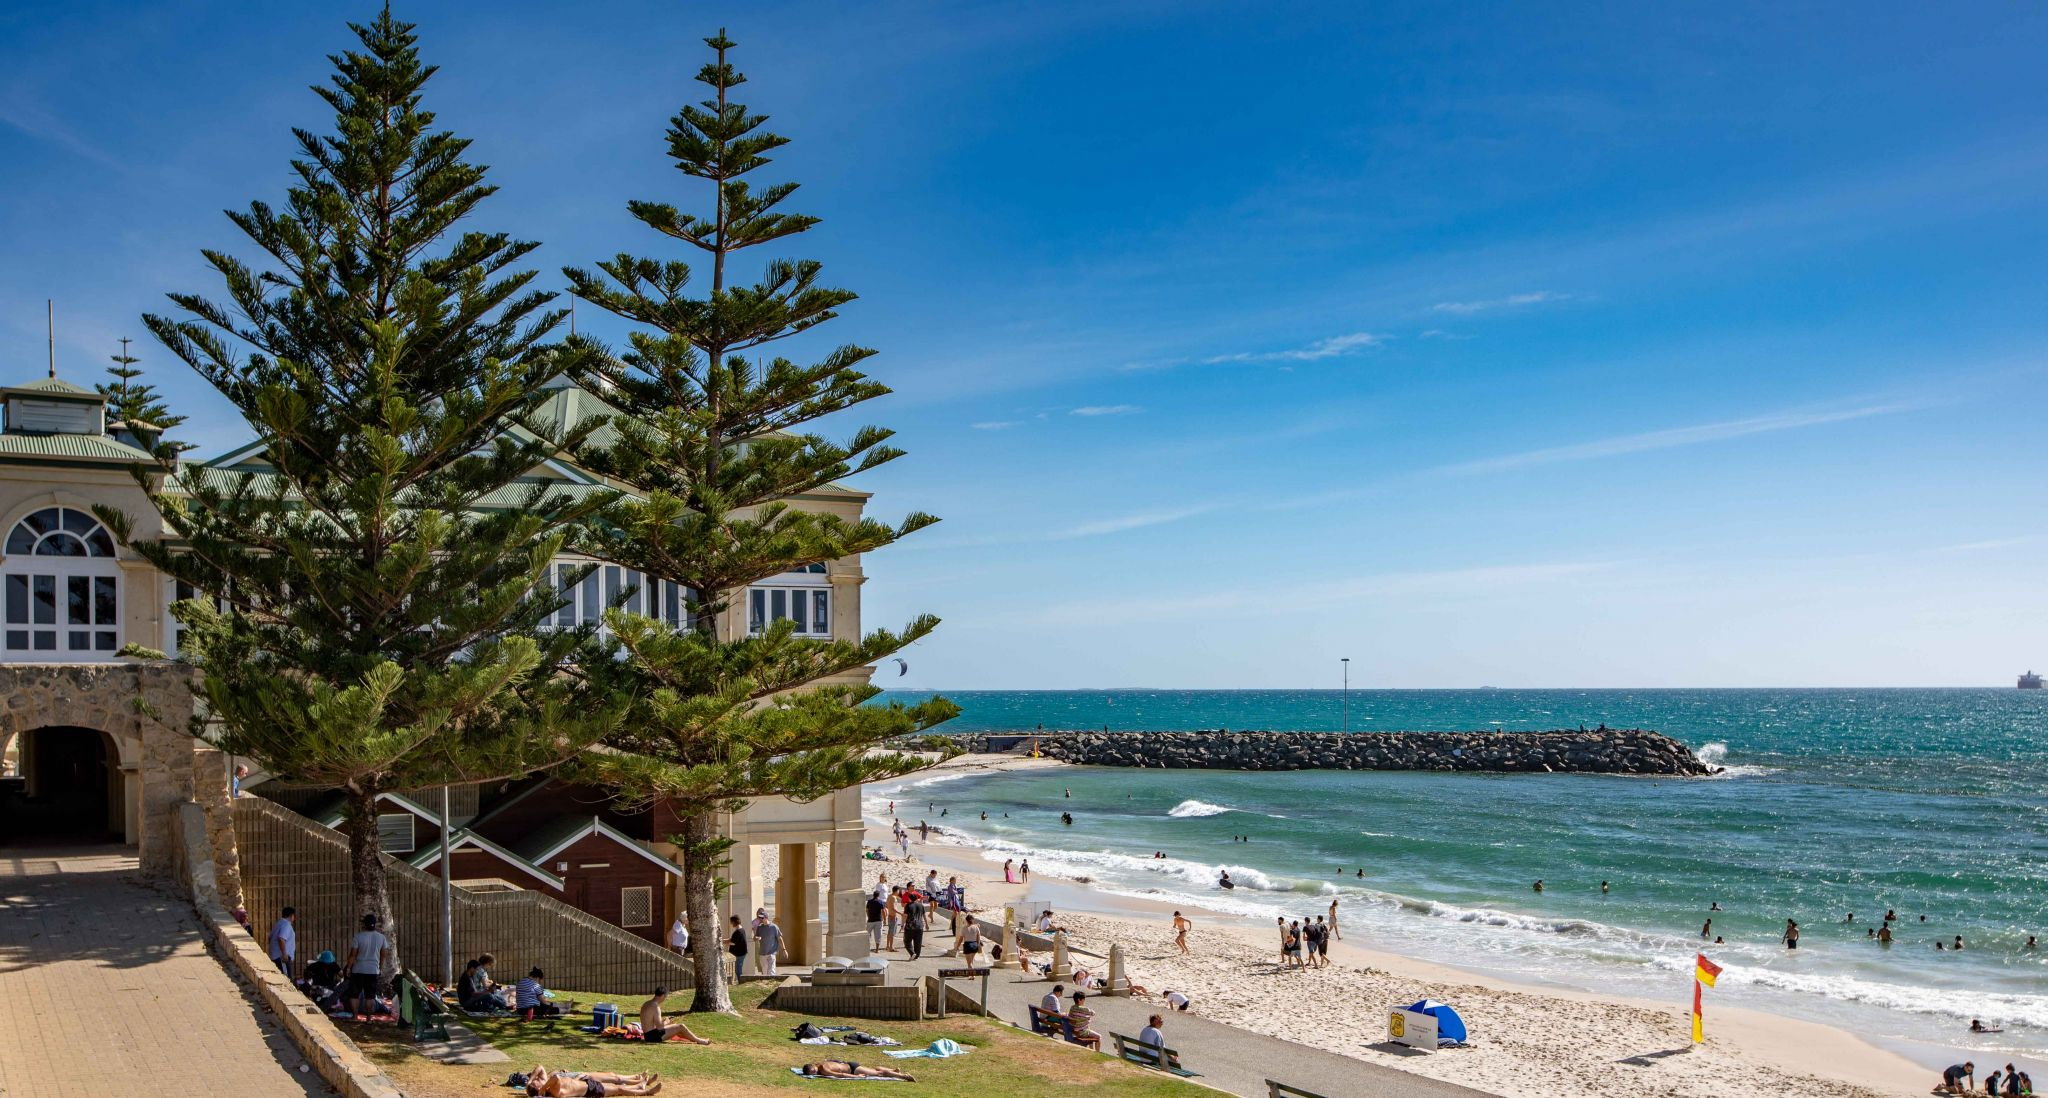 Cottesloe Beach & Groin Perth, Western Australia, Australia